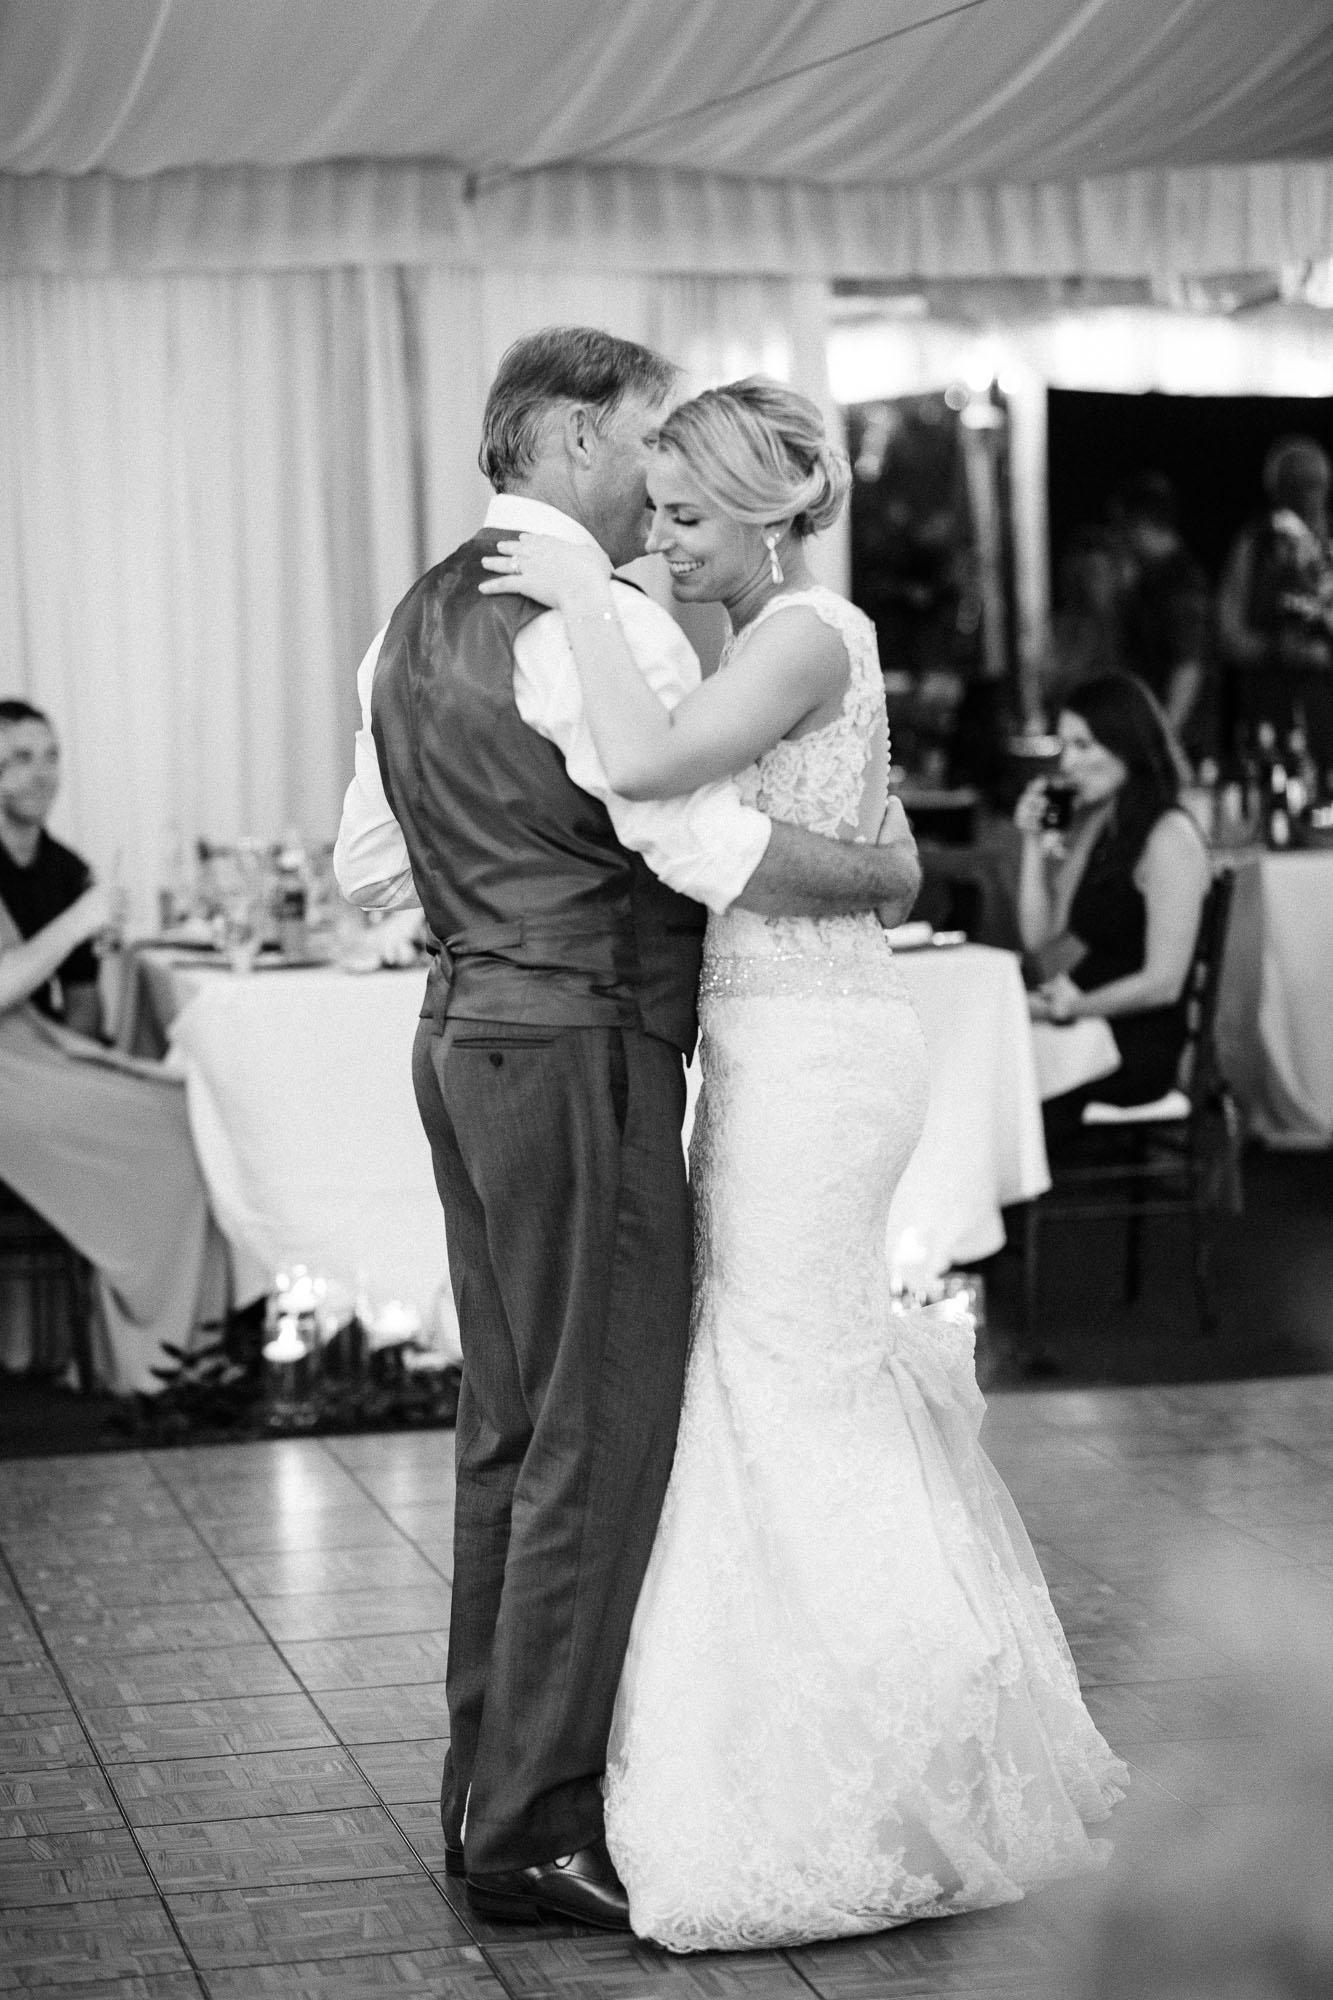 Allenberry-resort-historic-pennsylvania-wedding-22557.jpg